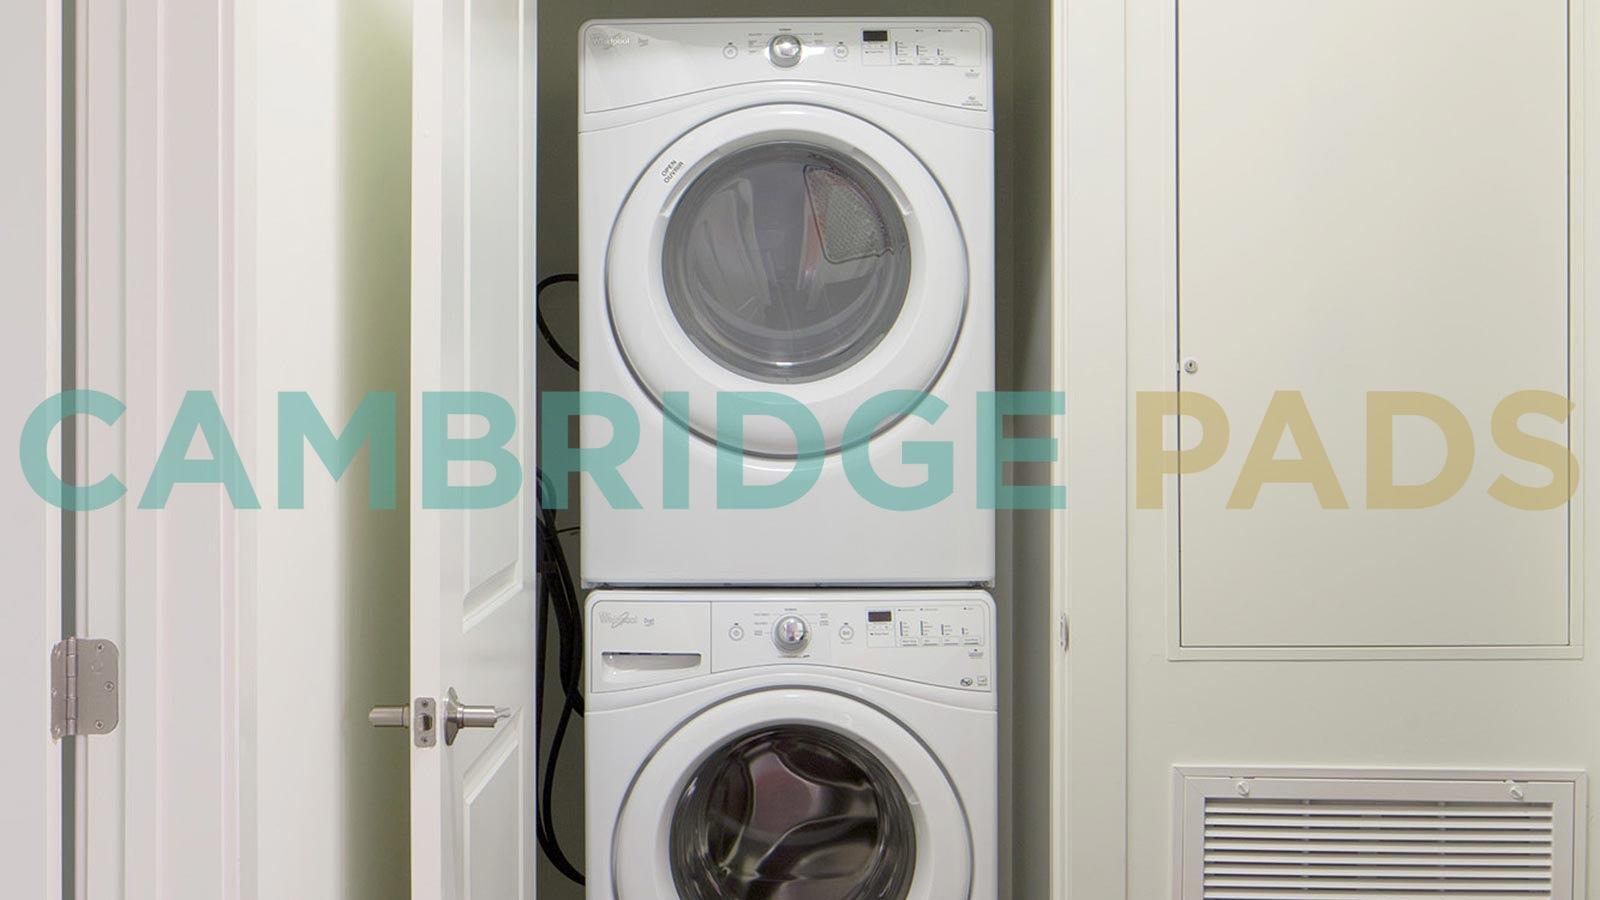 Atmark Cambridge laundry